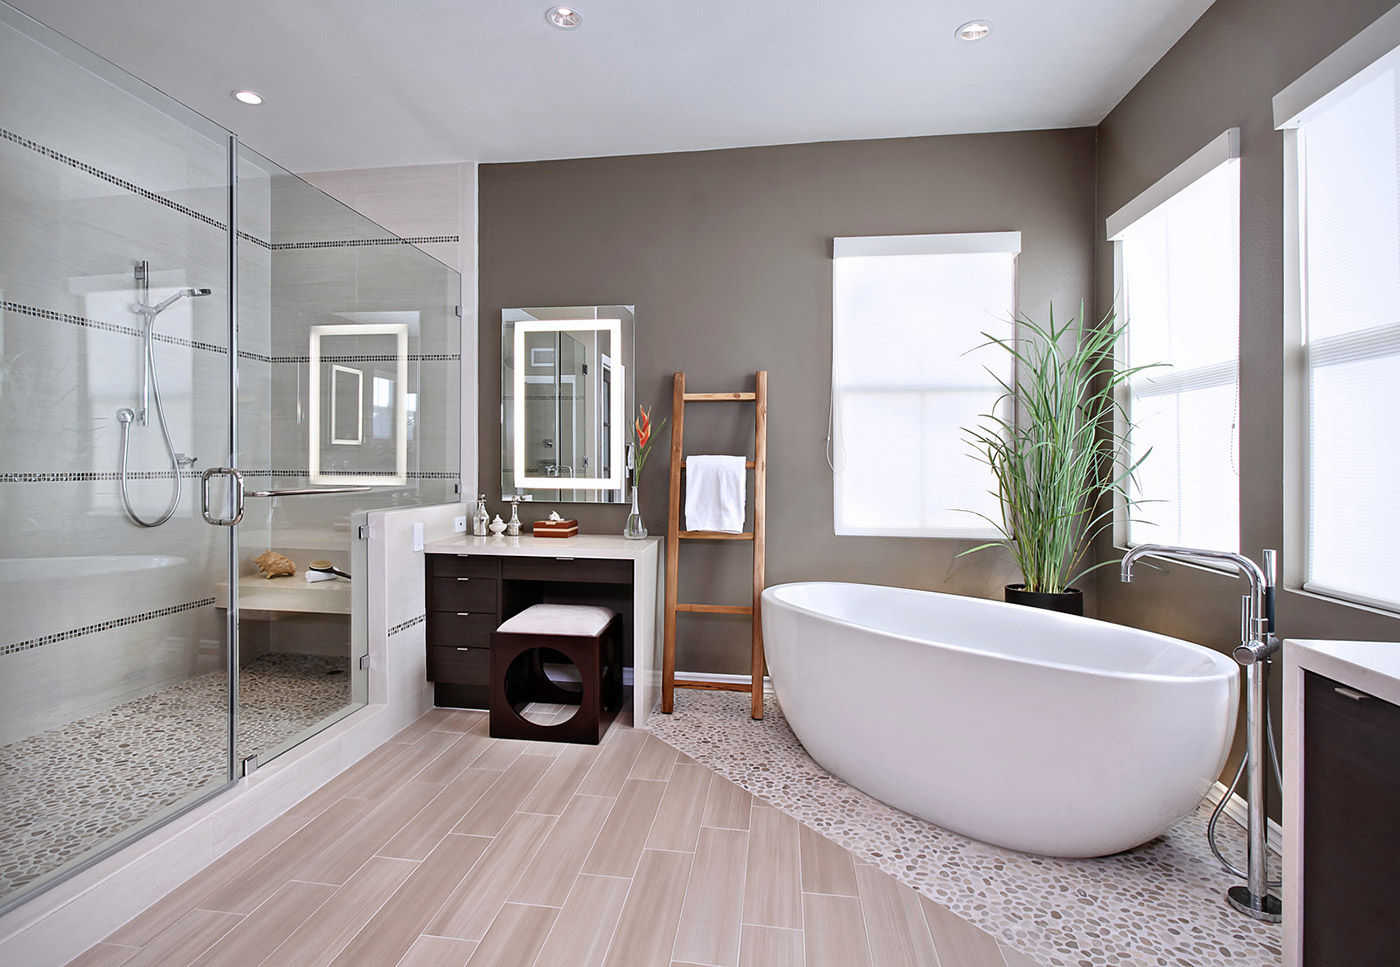 creating a timeless bathroom look all